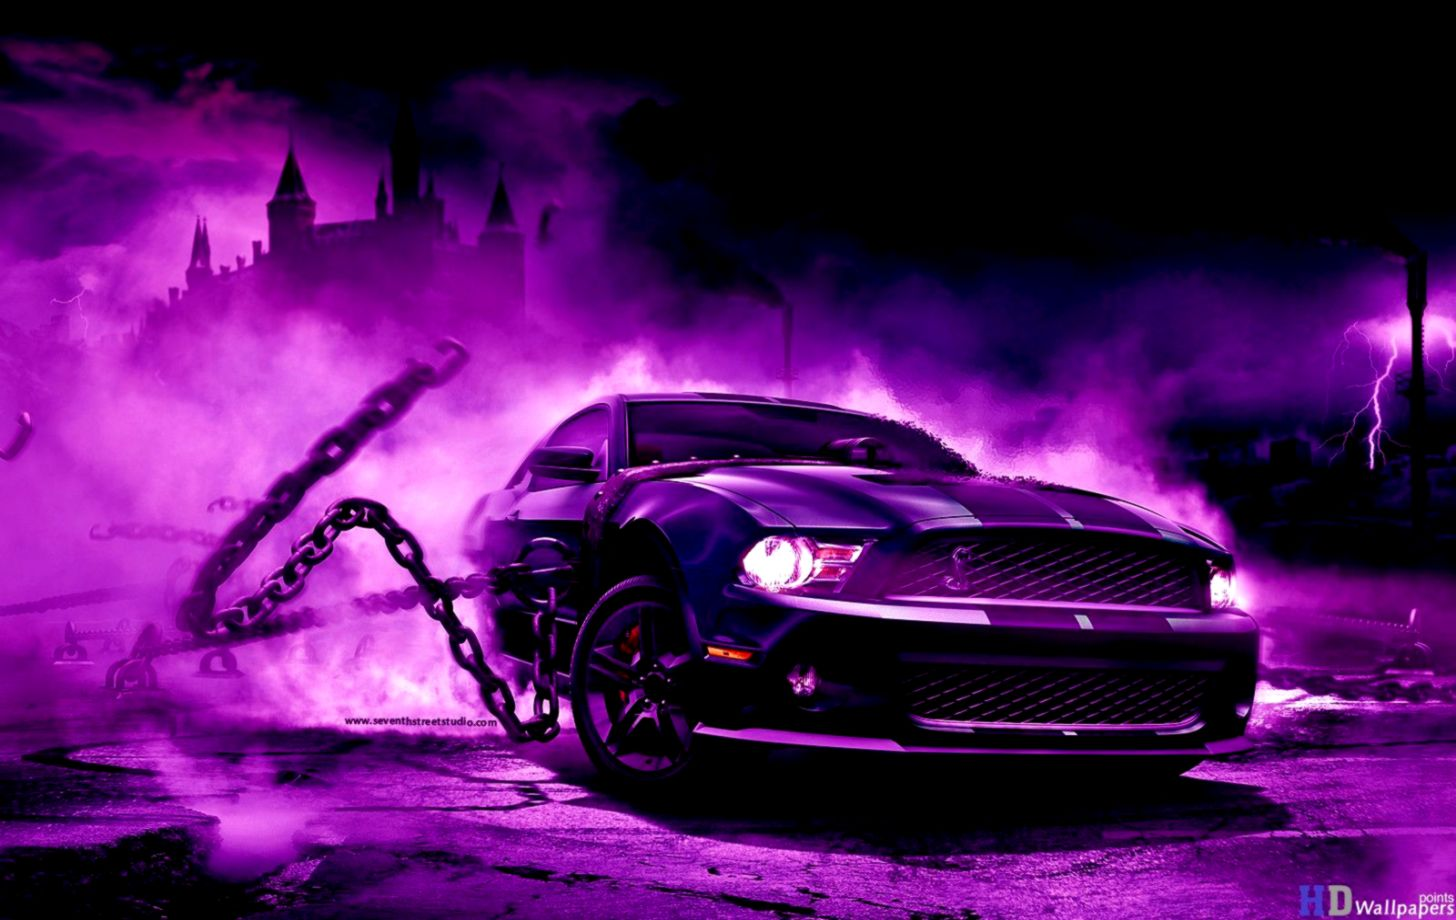 Cool Car 3d Wallpapers Hd Background Desktop Wallpaper Background Hd